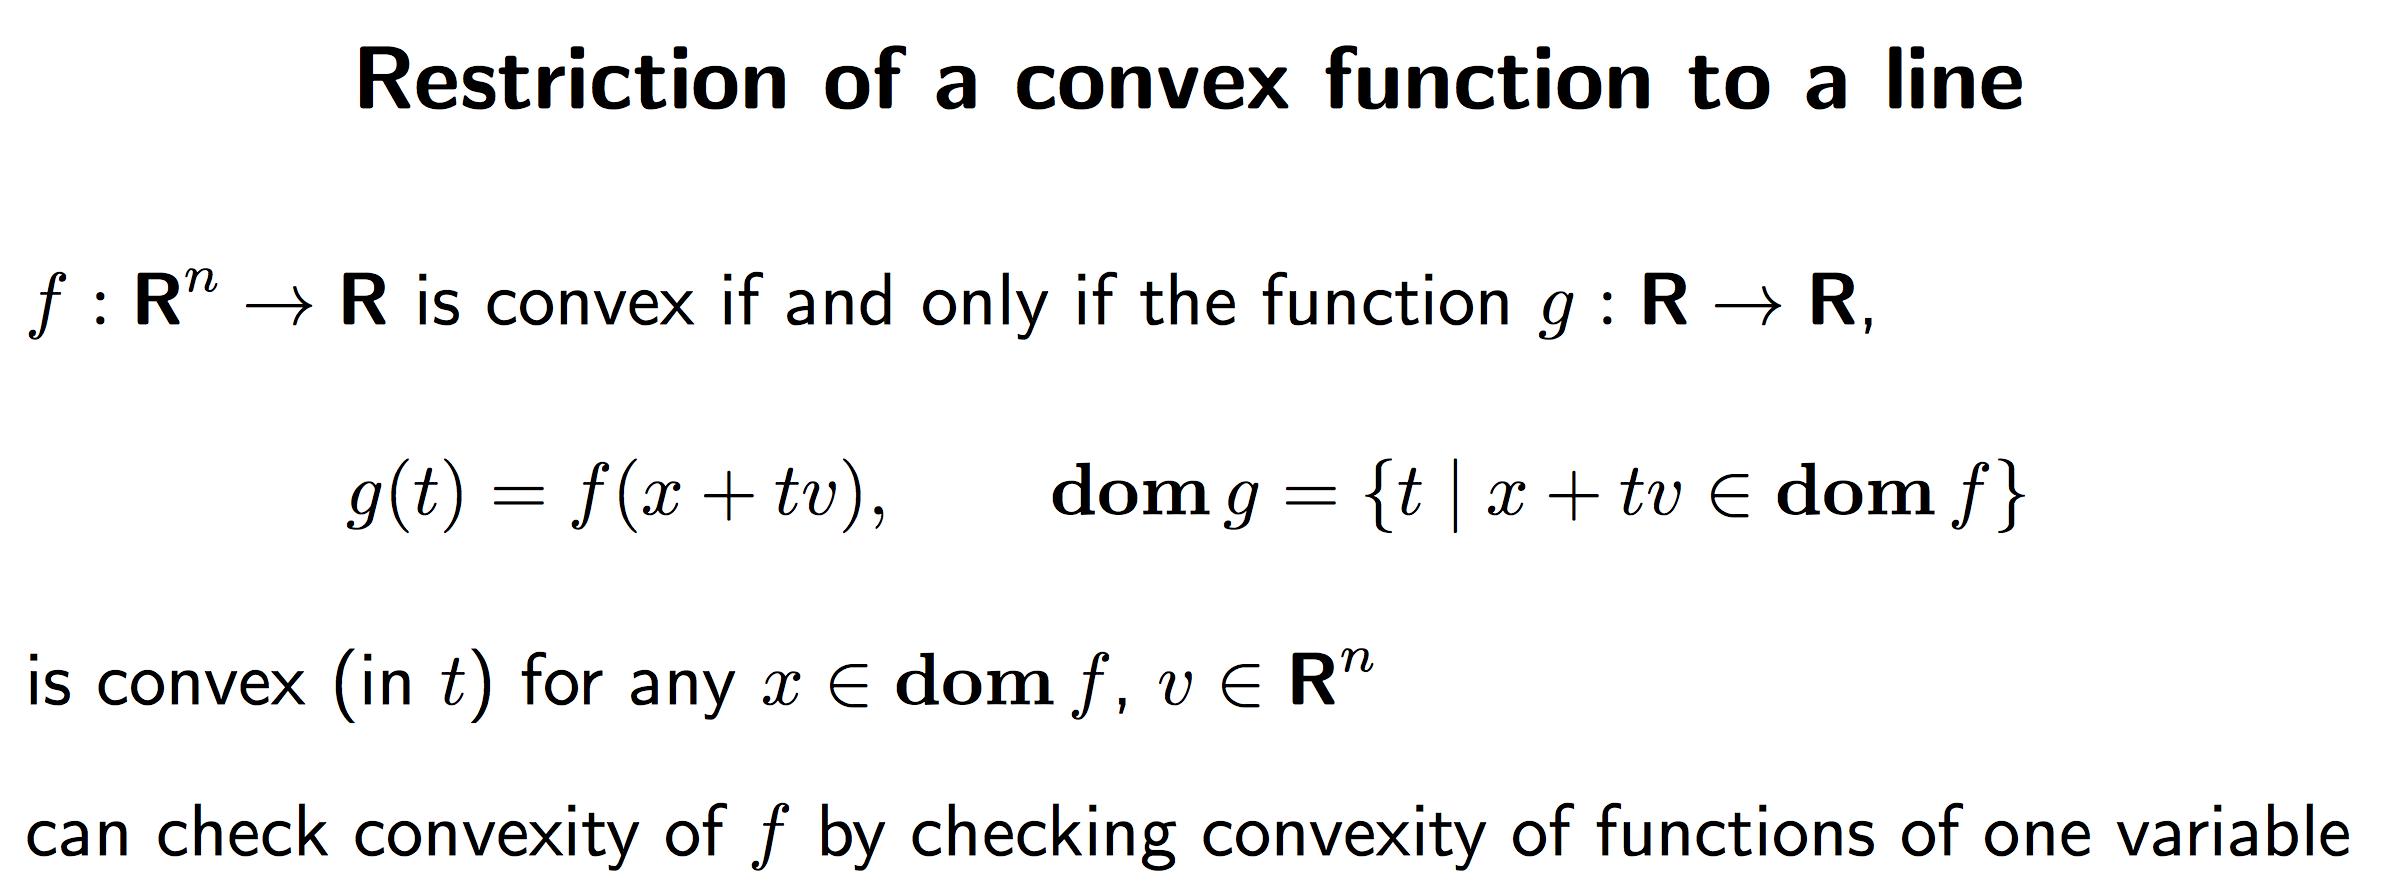 stephen boyd convex optimization solution manual pdf